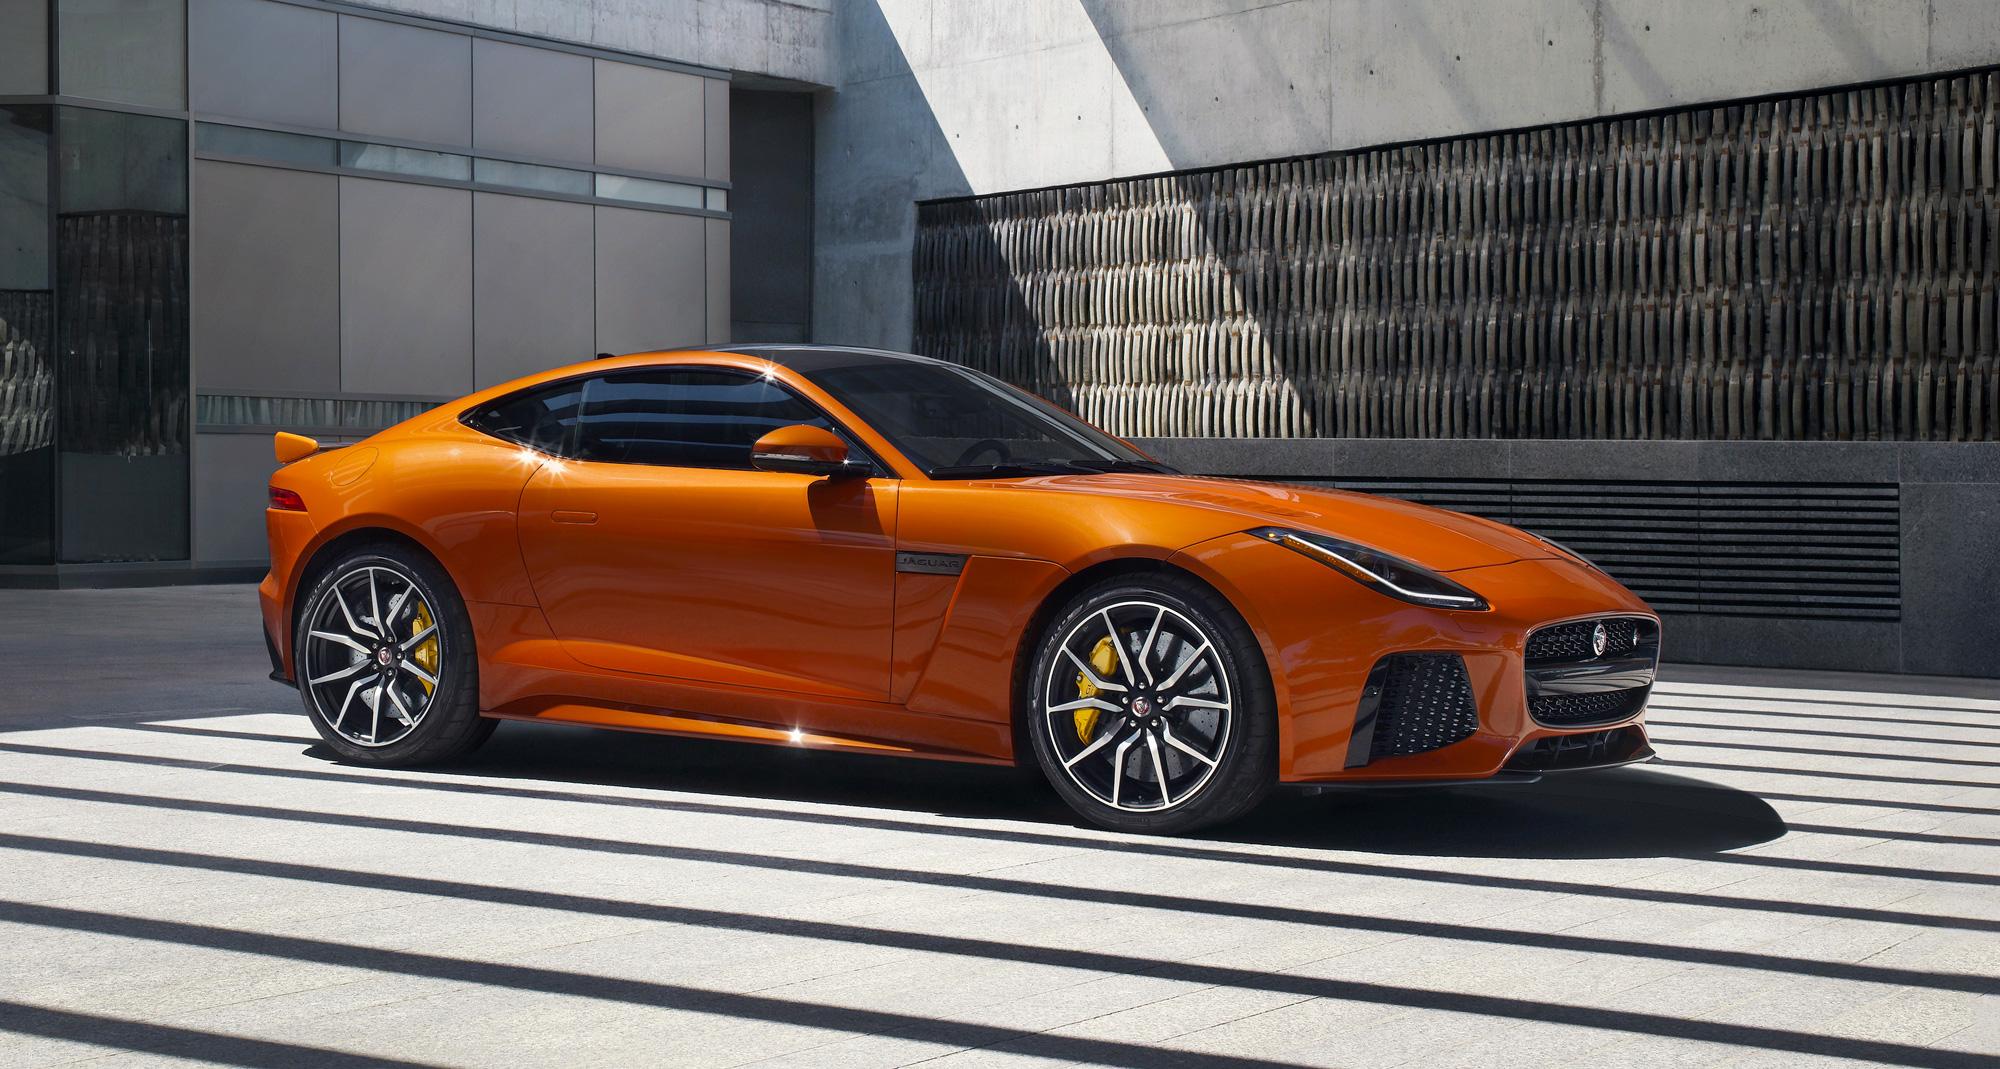 The Ftype Svr  Jaguar's Allweather Supercar  Luxurious